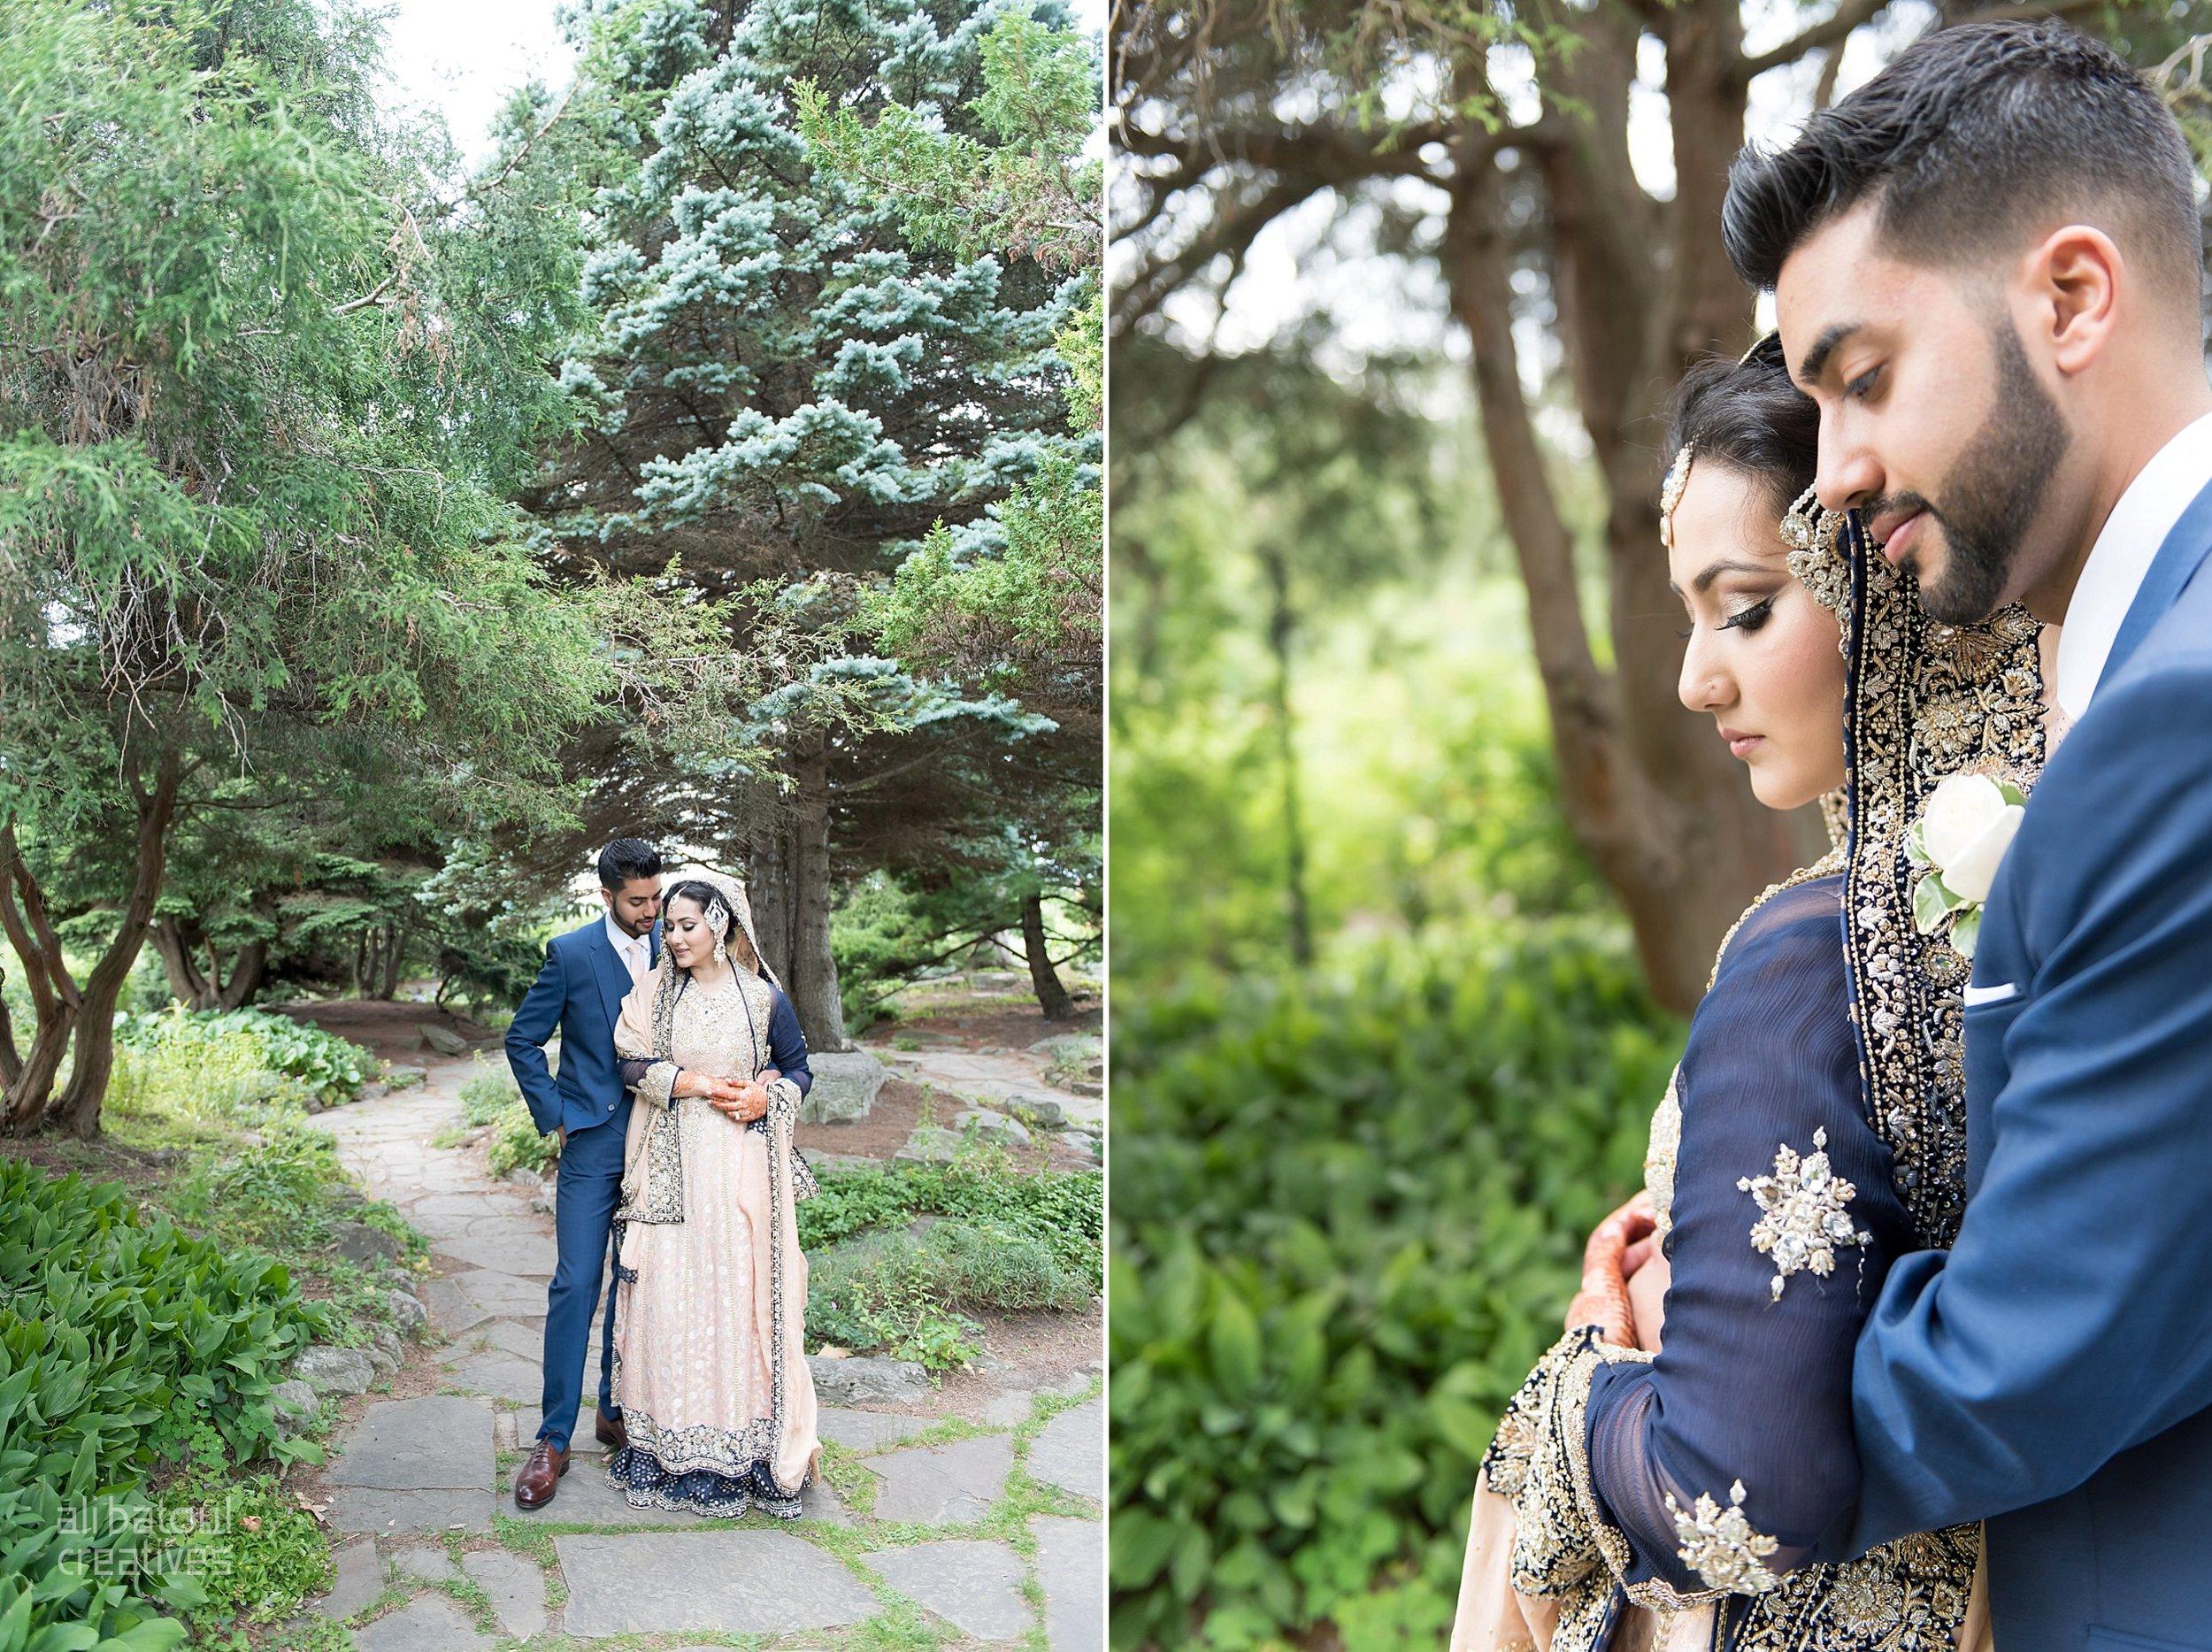 Alina + Mahmood - Ali Batoul Creatives Blog-53_Stomped.jpg